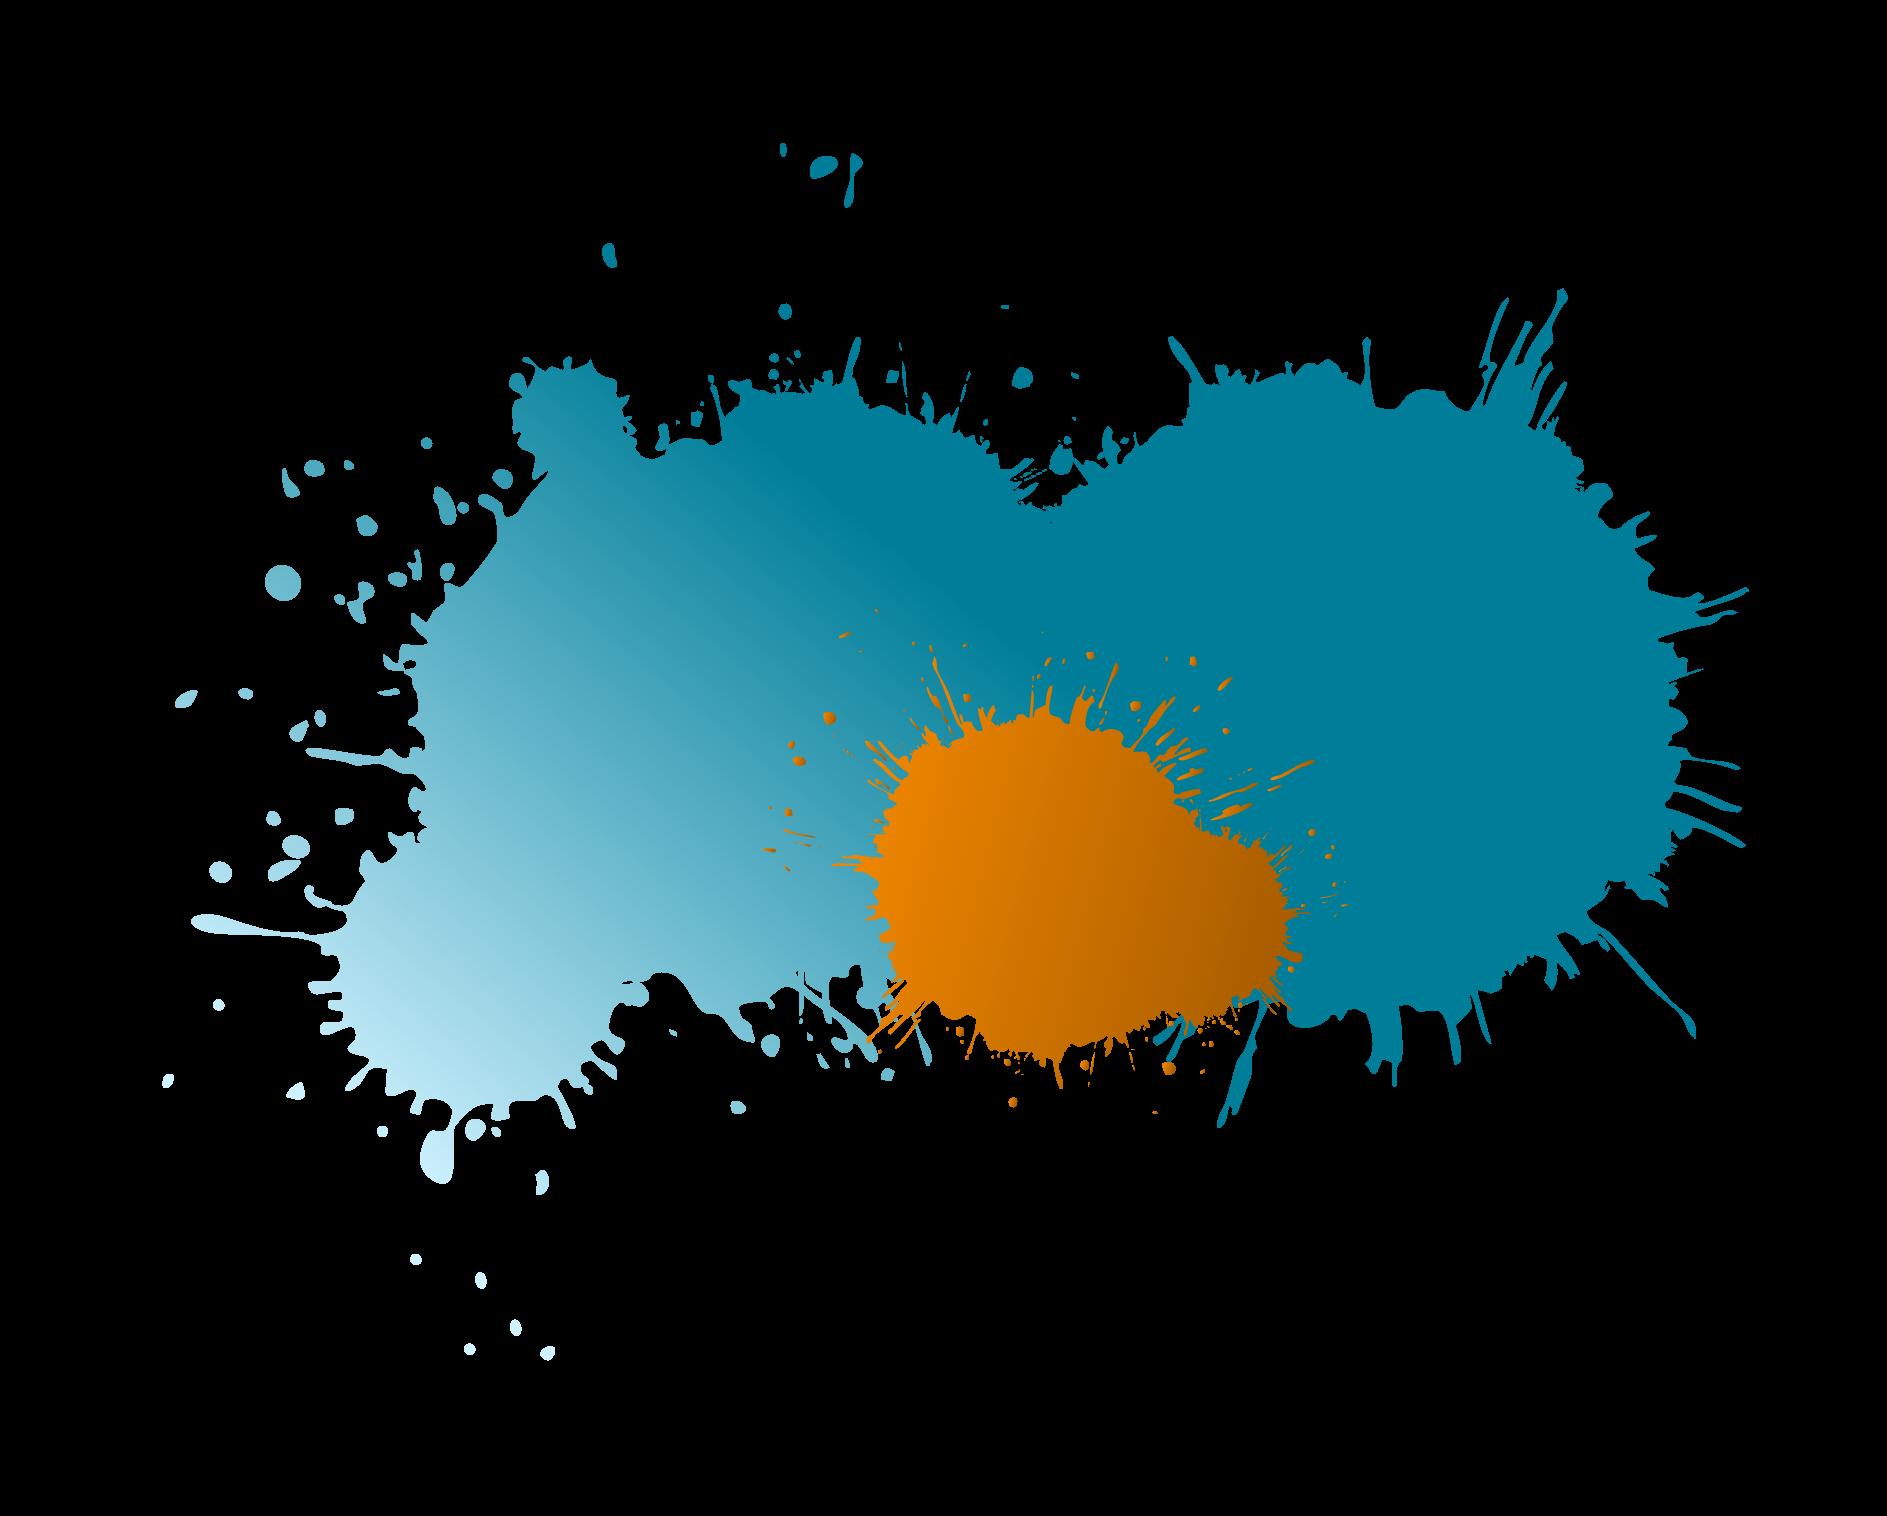 http://orange-blaue-farbkleckse-groß